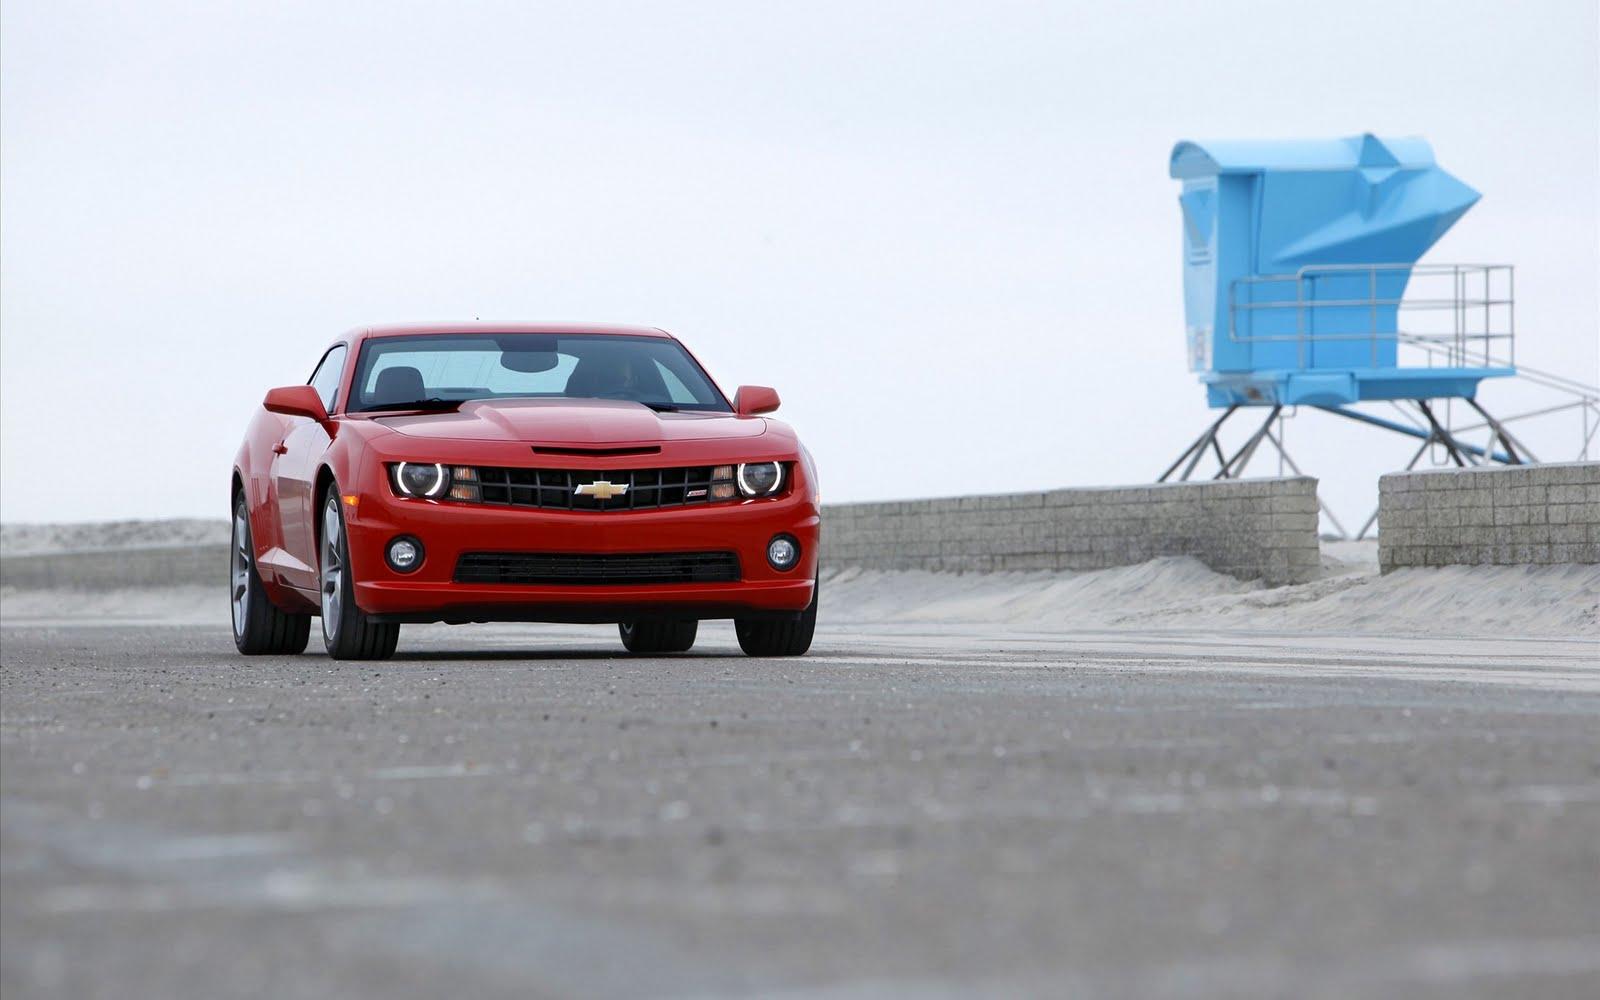 http://3.bp.blogspot.com/-IpJl499iLbs/Tm9y9i13DyI/AAAAAAAAI5g/TqvbzapH0_U/s1600/2010-Chevrolet-Camaro-SS-widescreen-20%255B1%255D.jpg